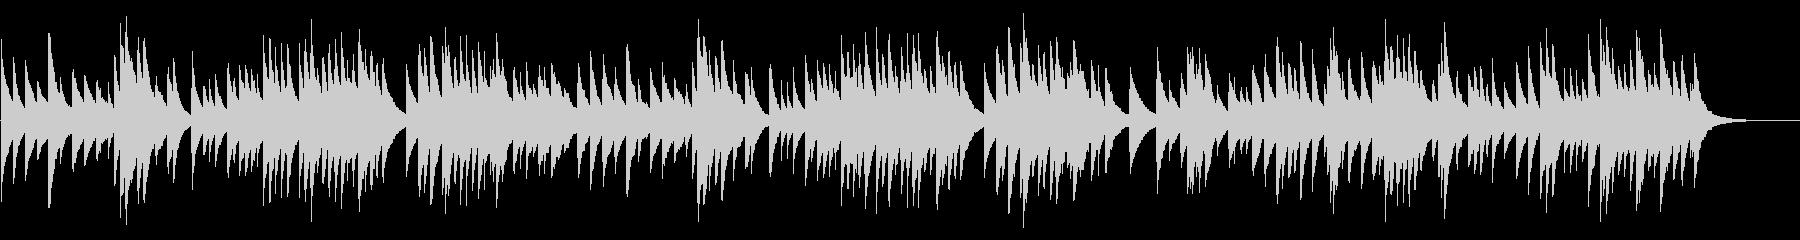 G線上のアリア 72弁オルゴールの未再生の波形